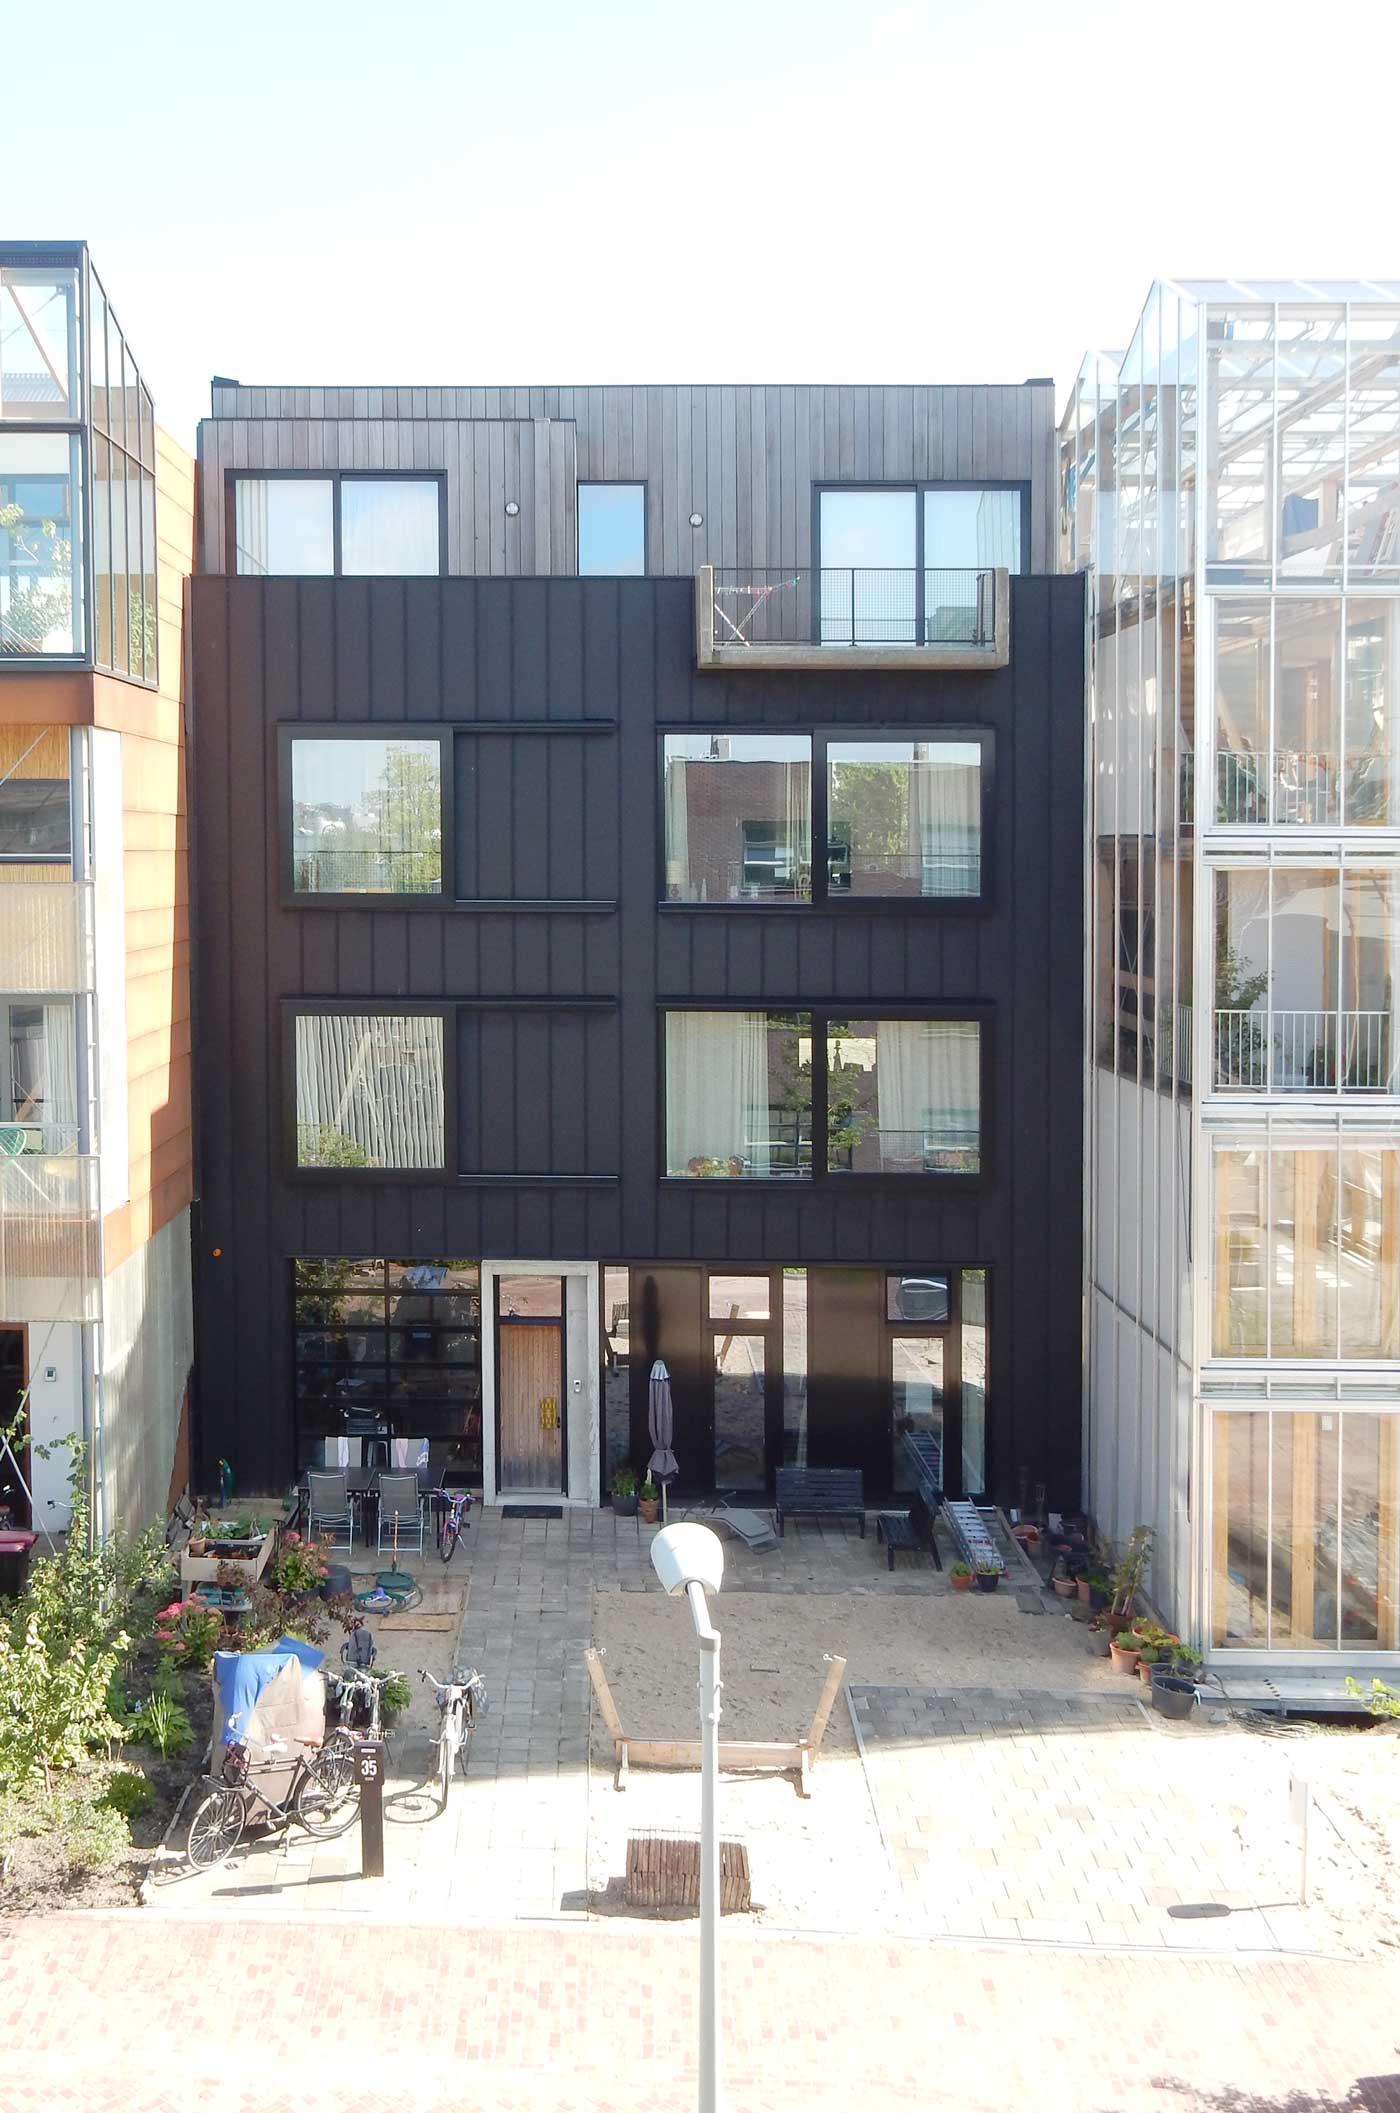 zelfbouw_amsterdam_architect